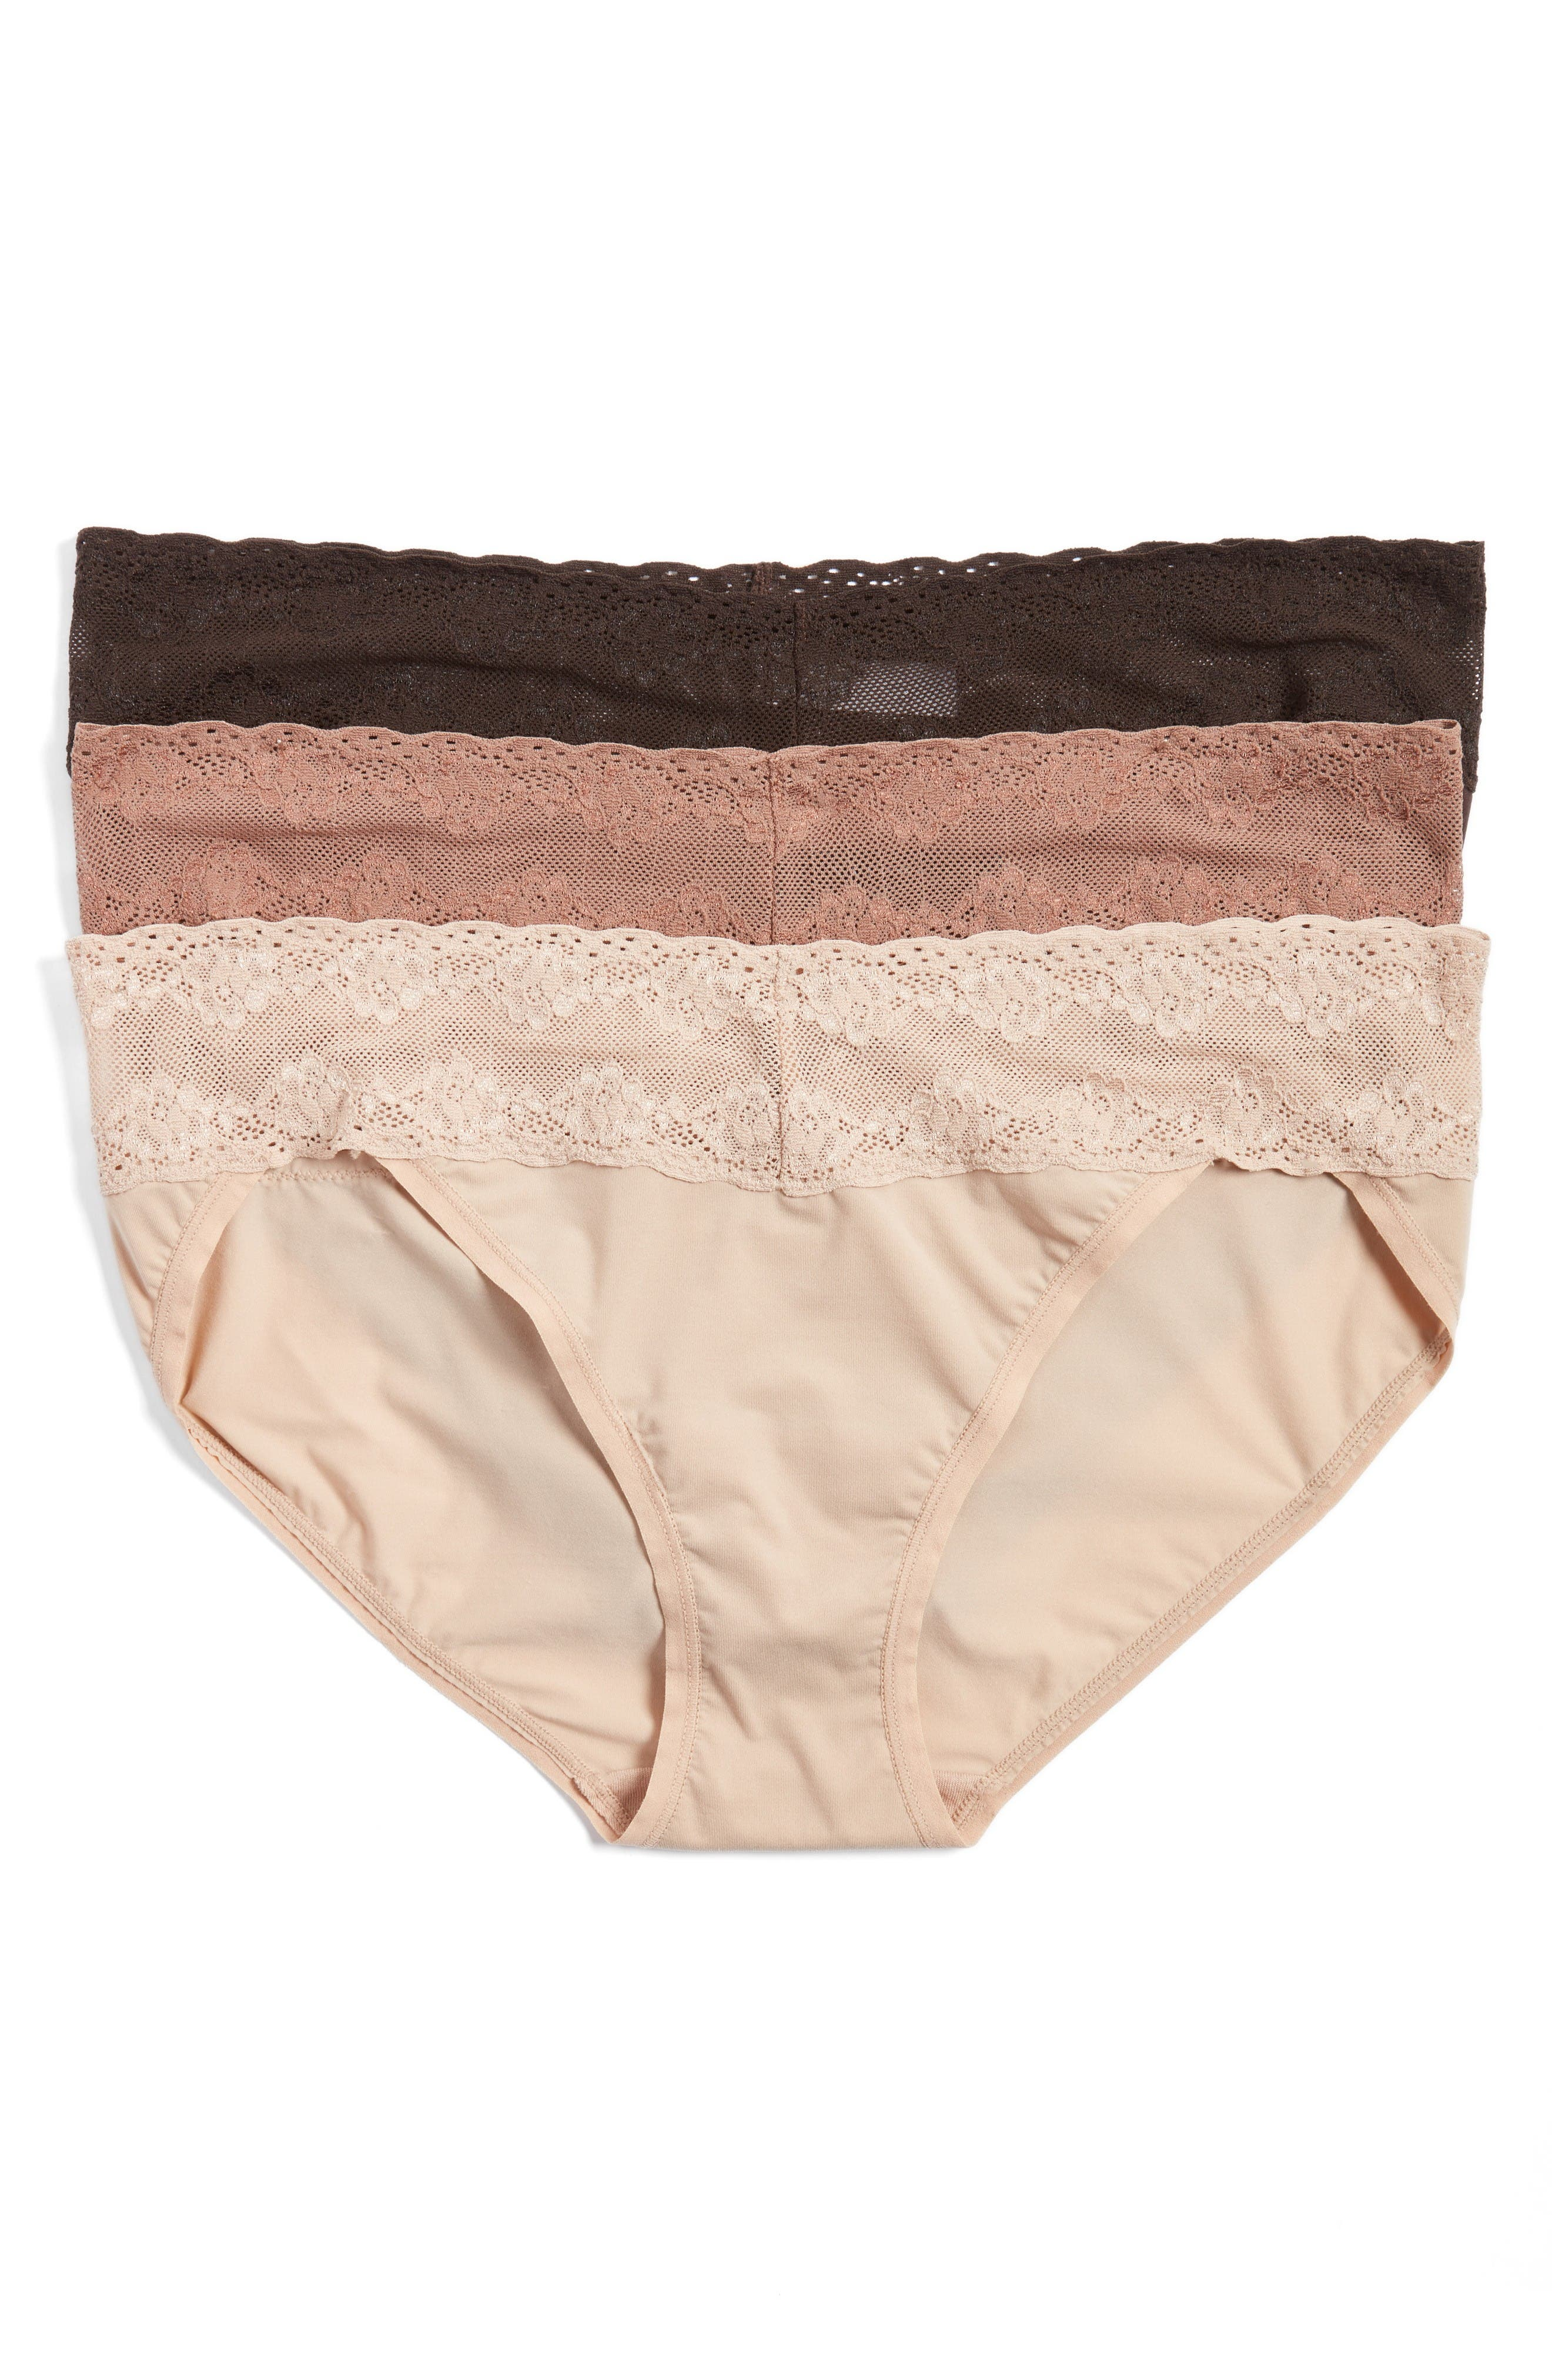 Natori 'Bliss Perfection' Bikini Briefs (3-Pack)